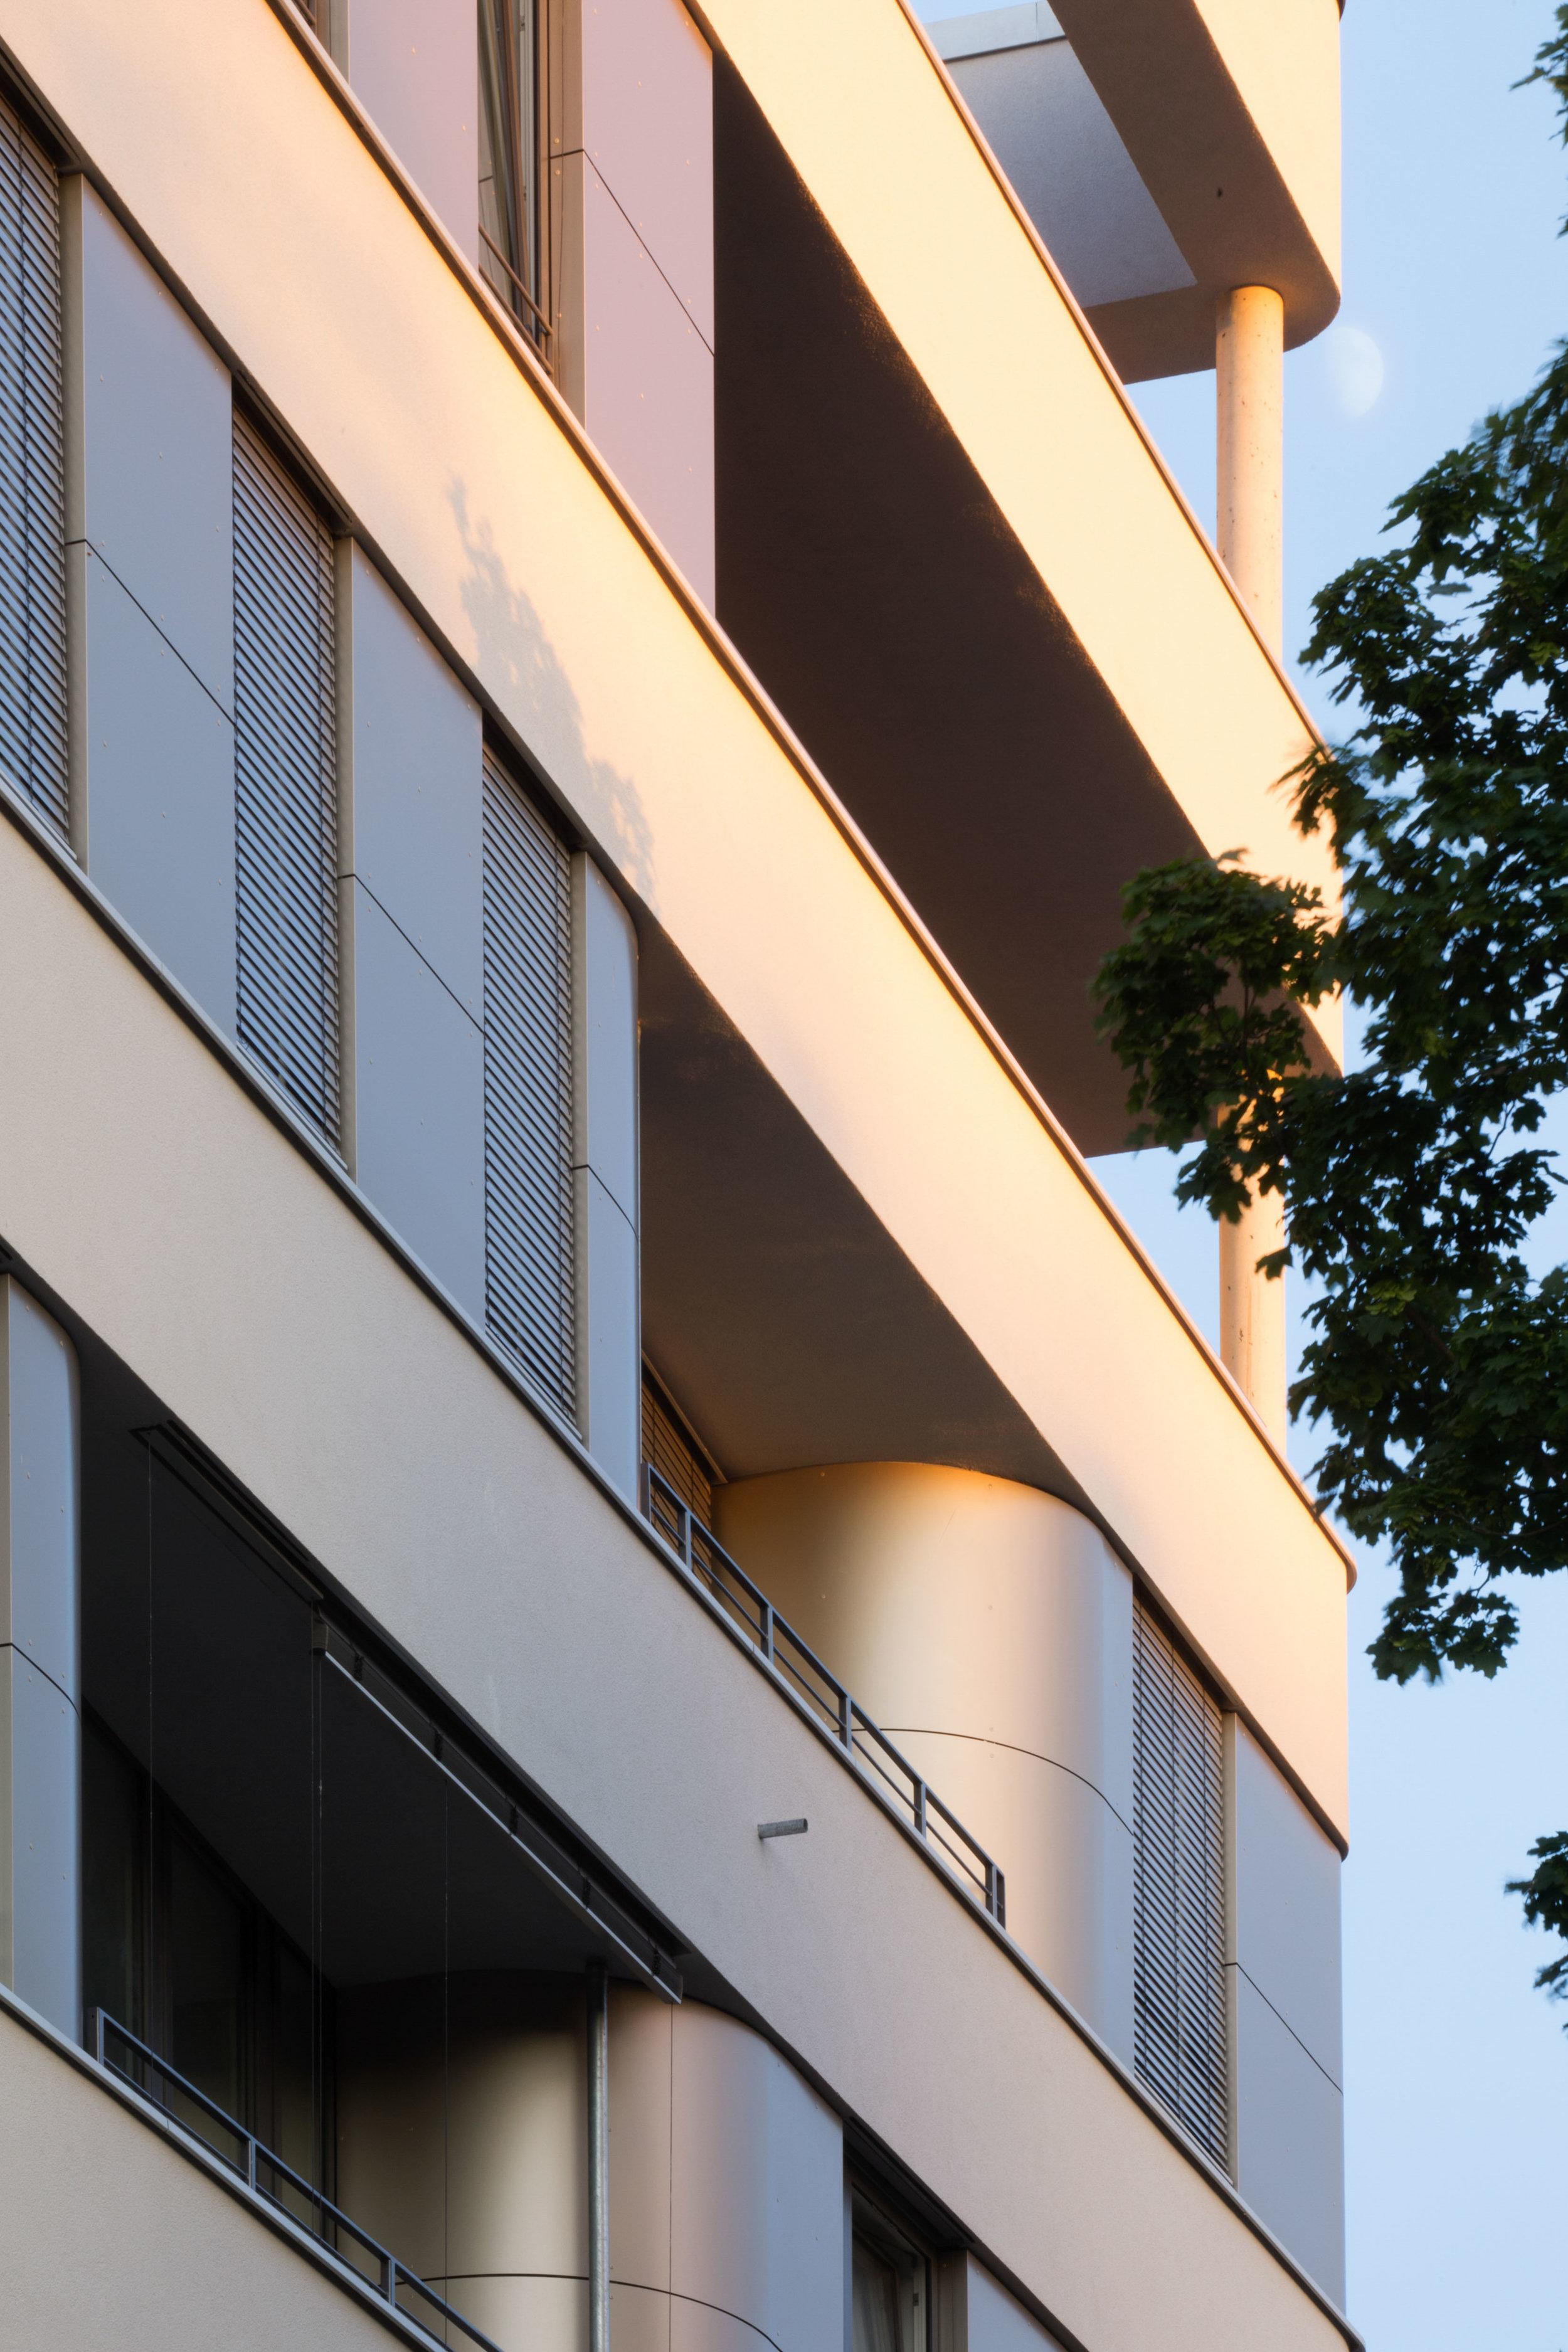 Private apartmenthouse, Lützowstraße, Berlin